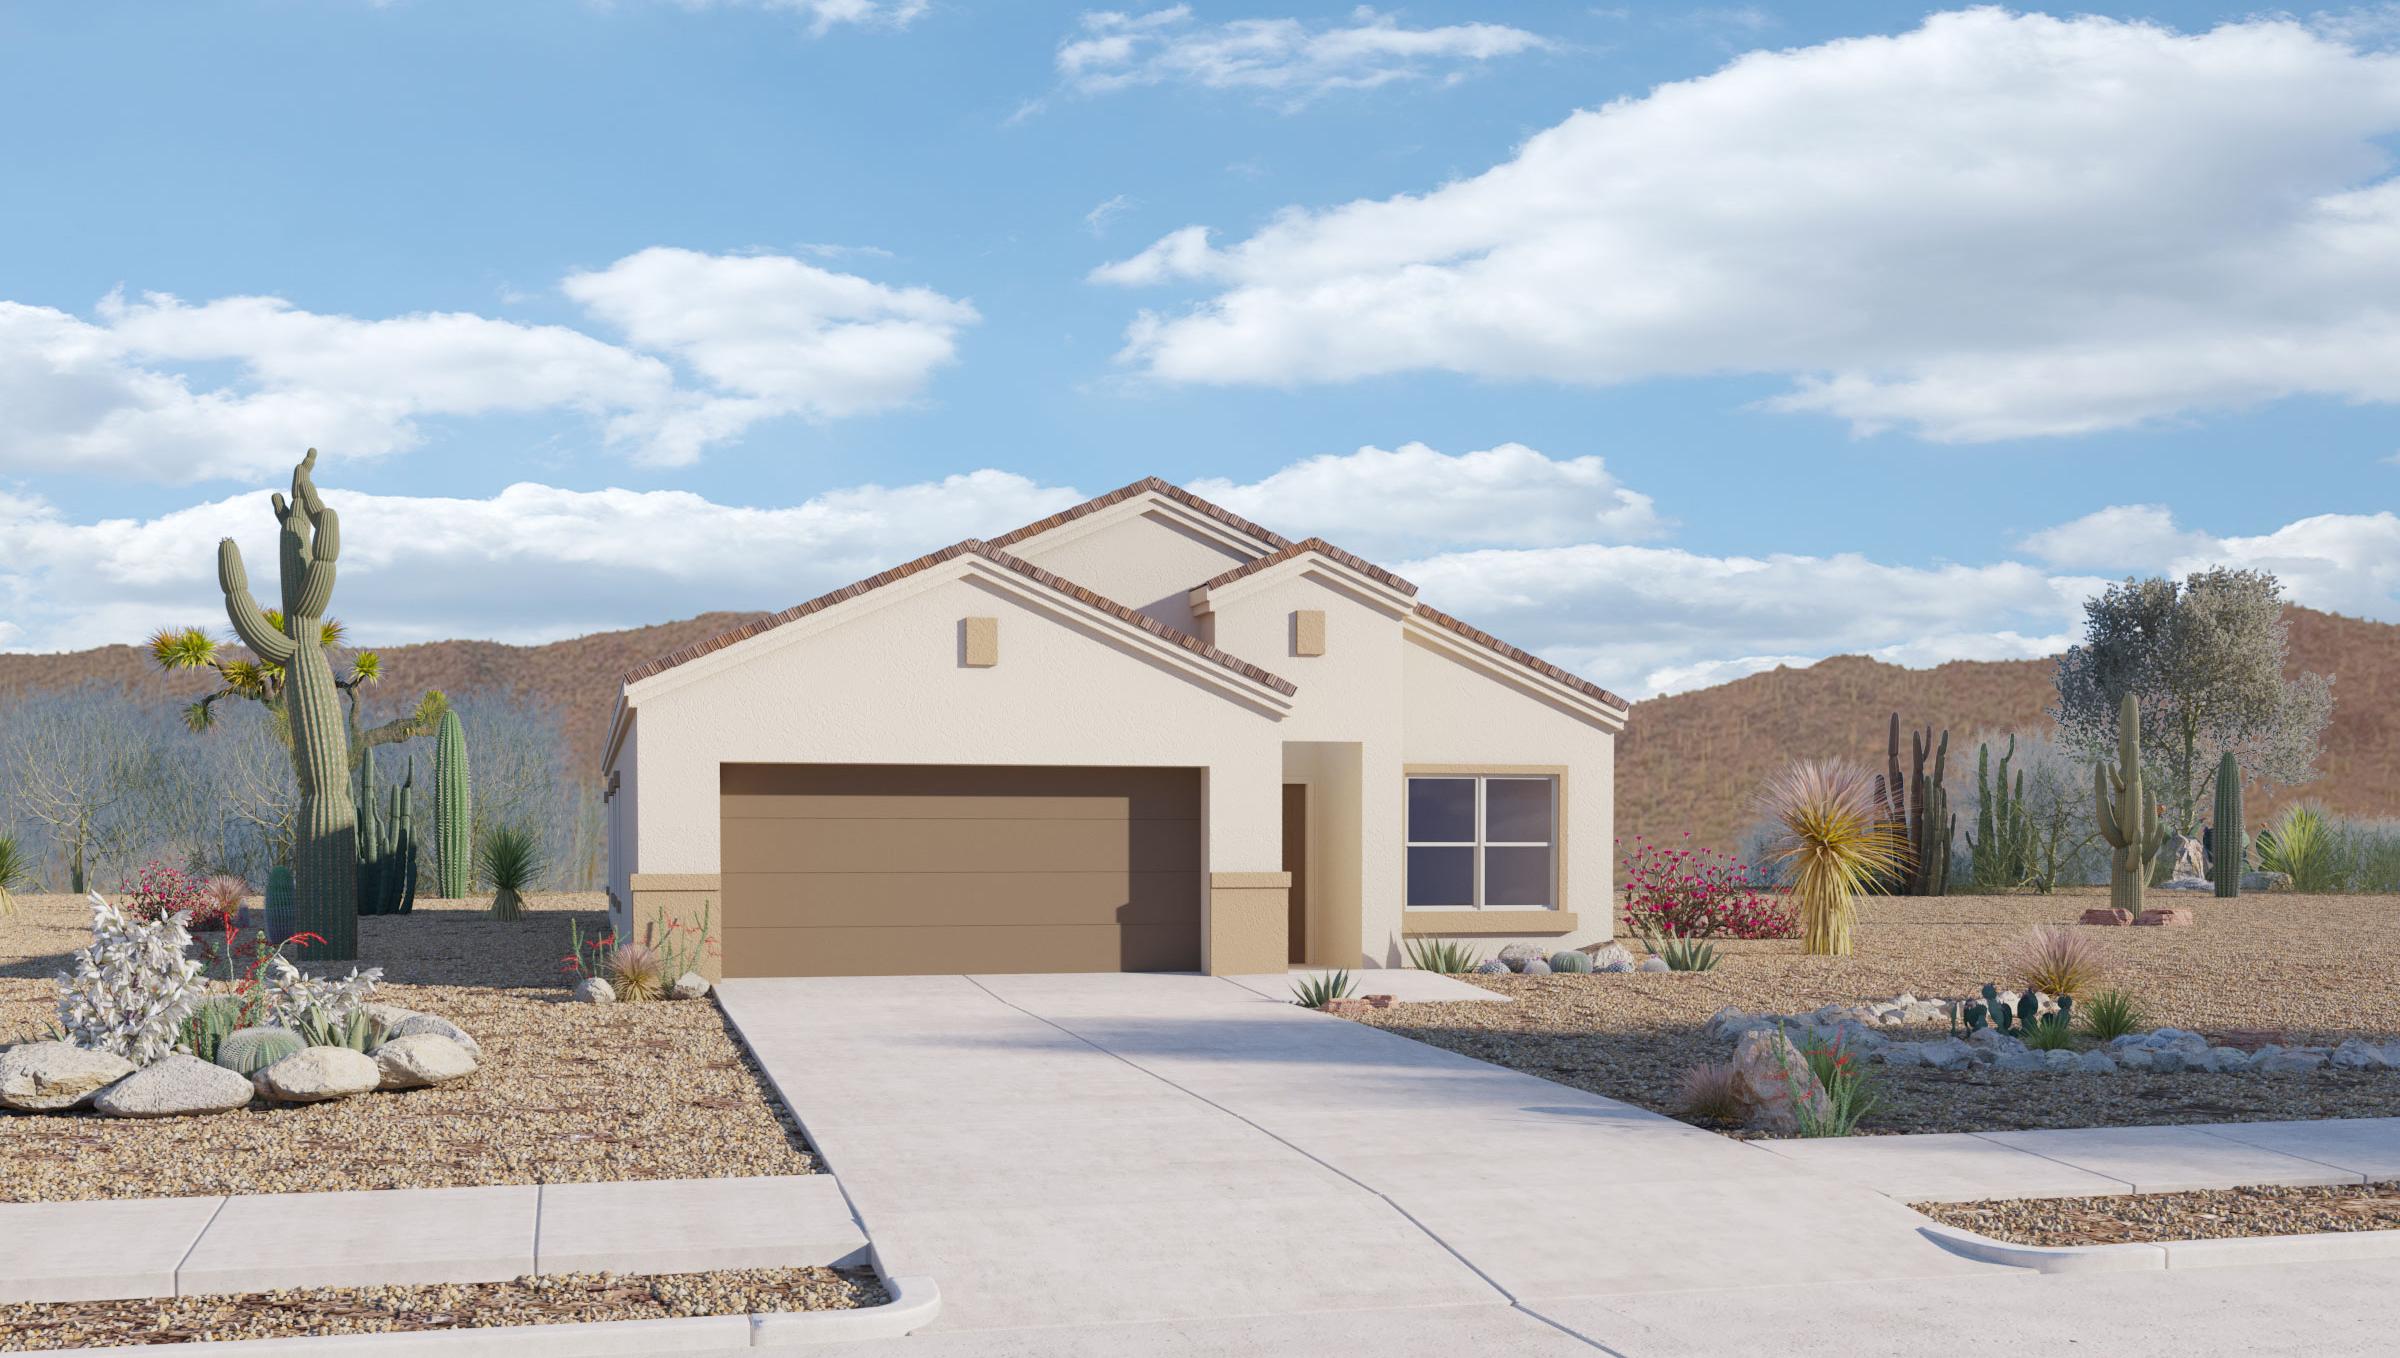 D.R. Horton Saguaro Bloom Mesquite Van Buren – Plan 3542 Single Family Home for Sale